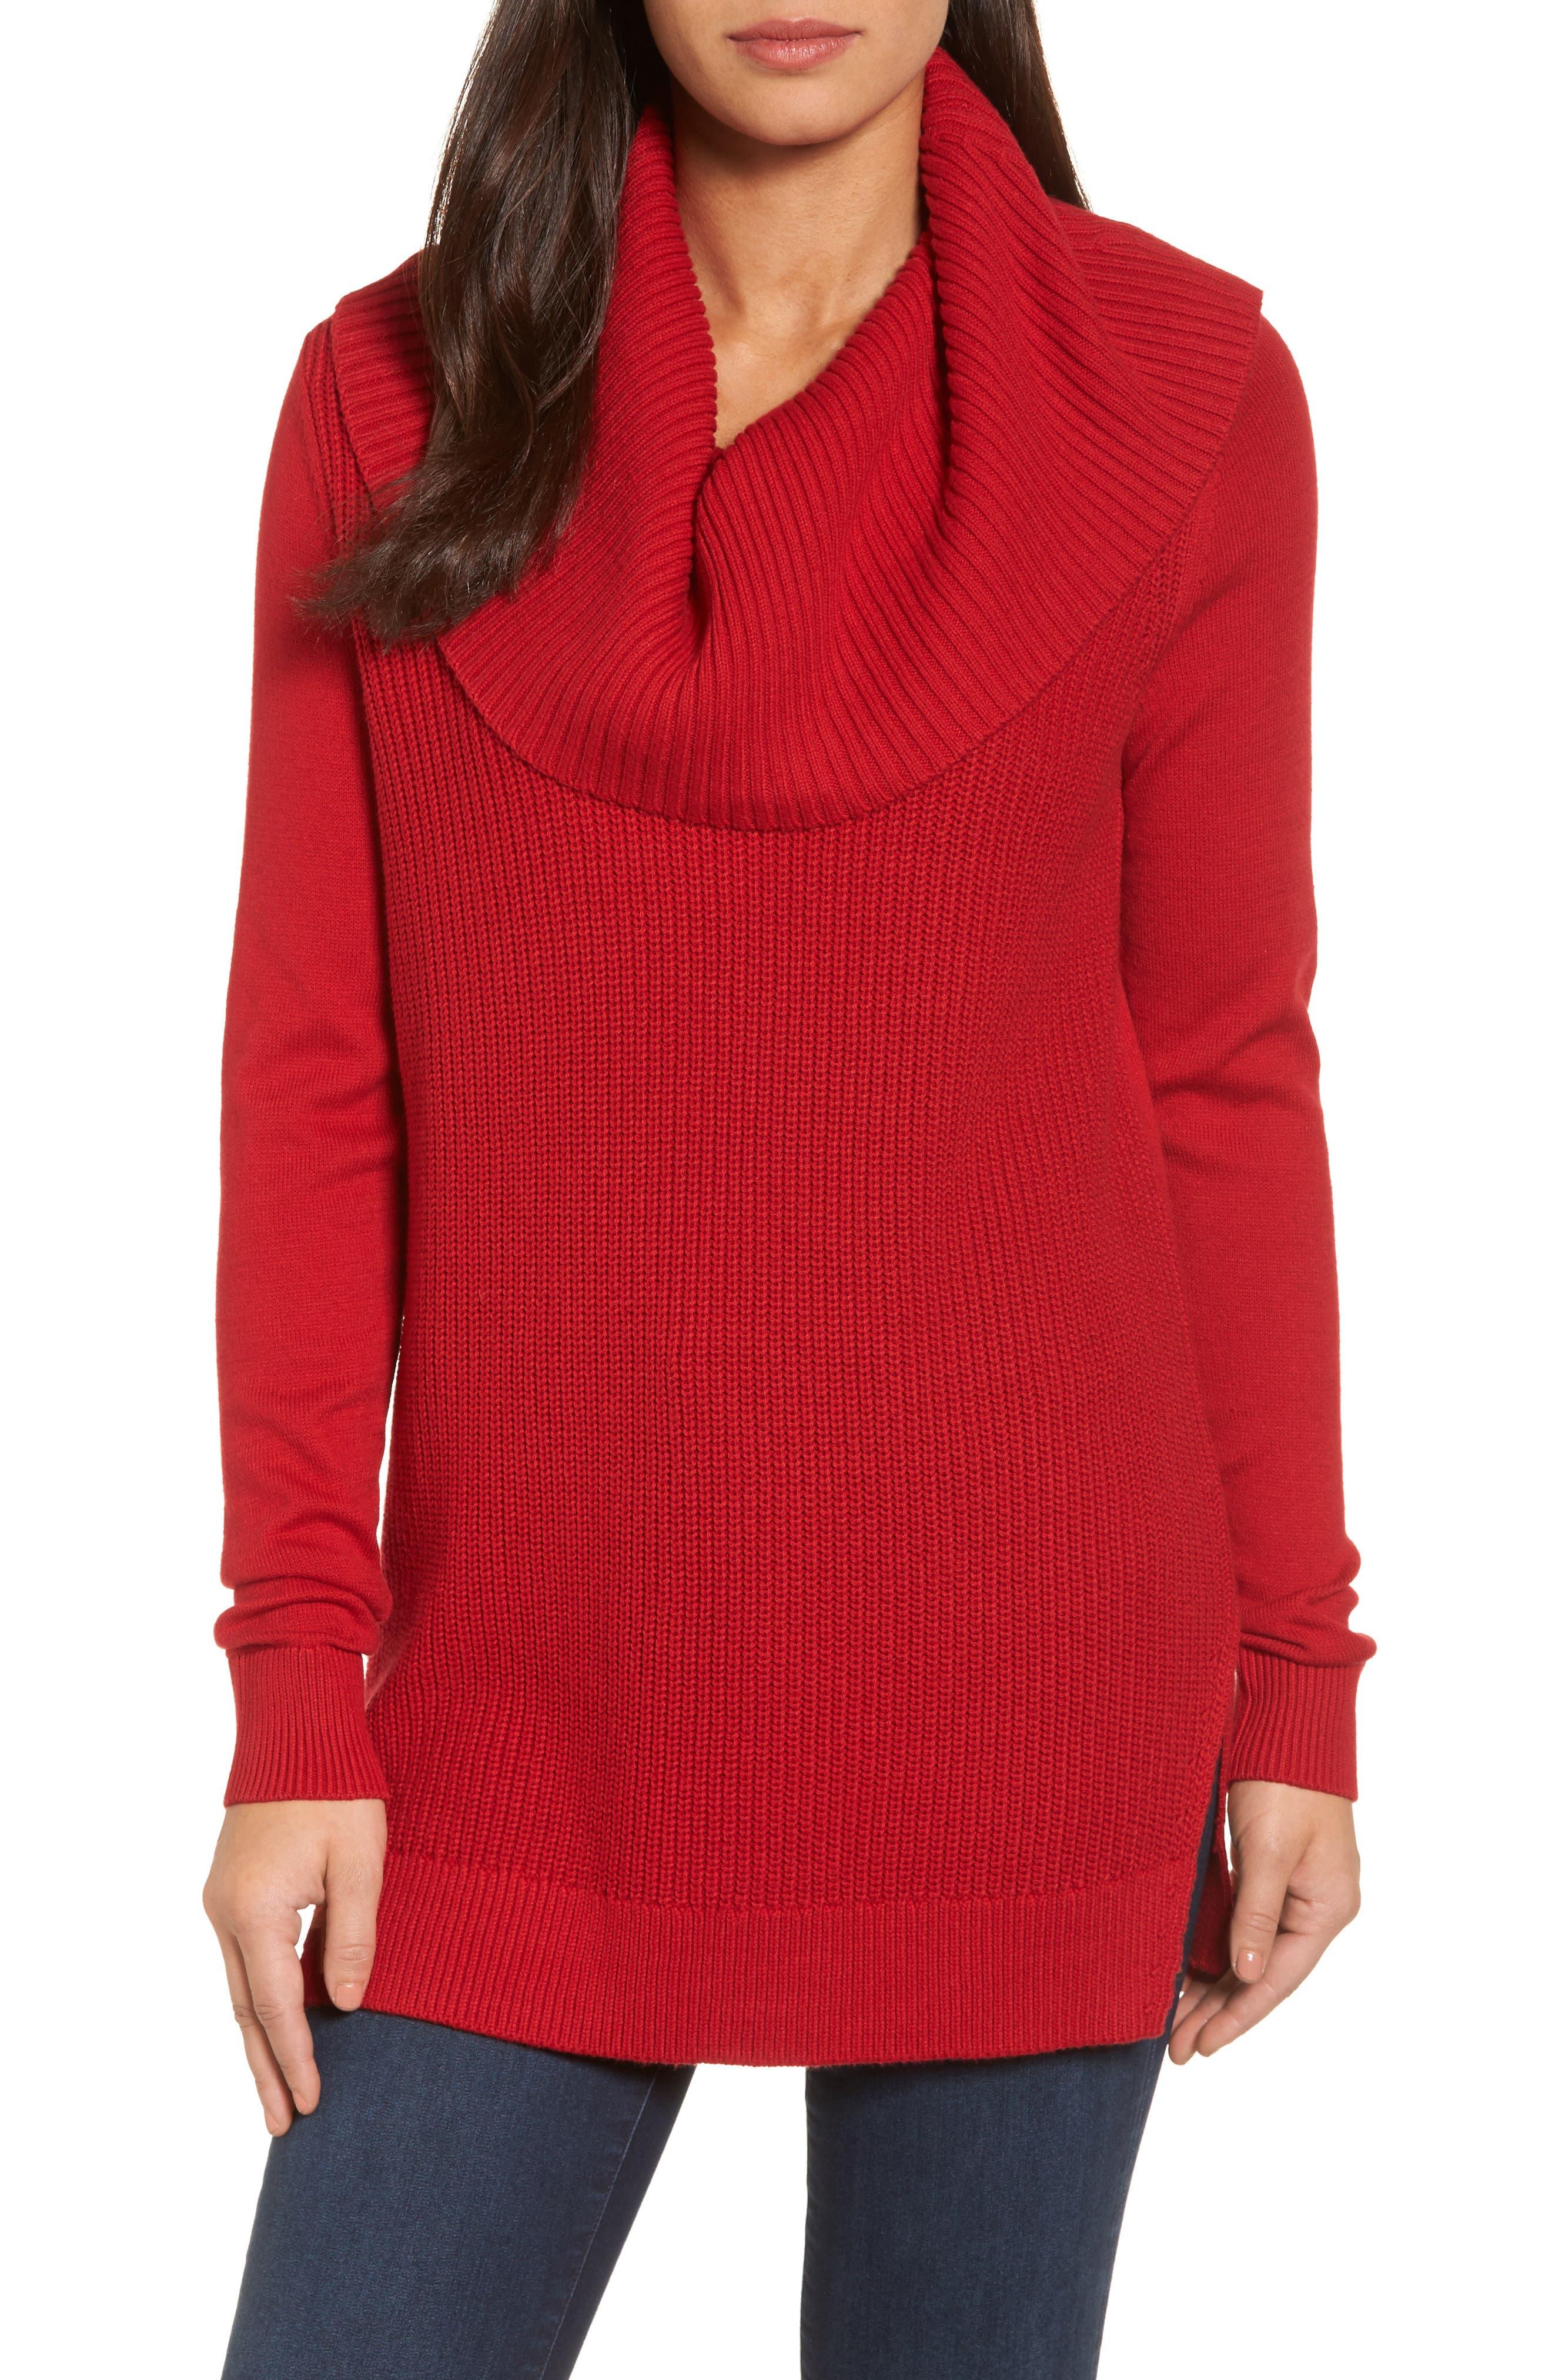 Alternate Image 1 Selected - MICHAEL Michael Kors Cowl Neck Sweater